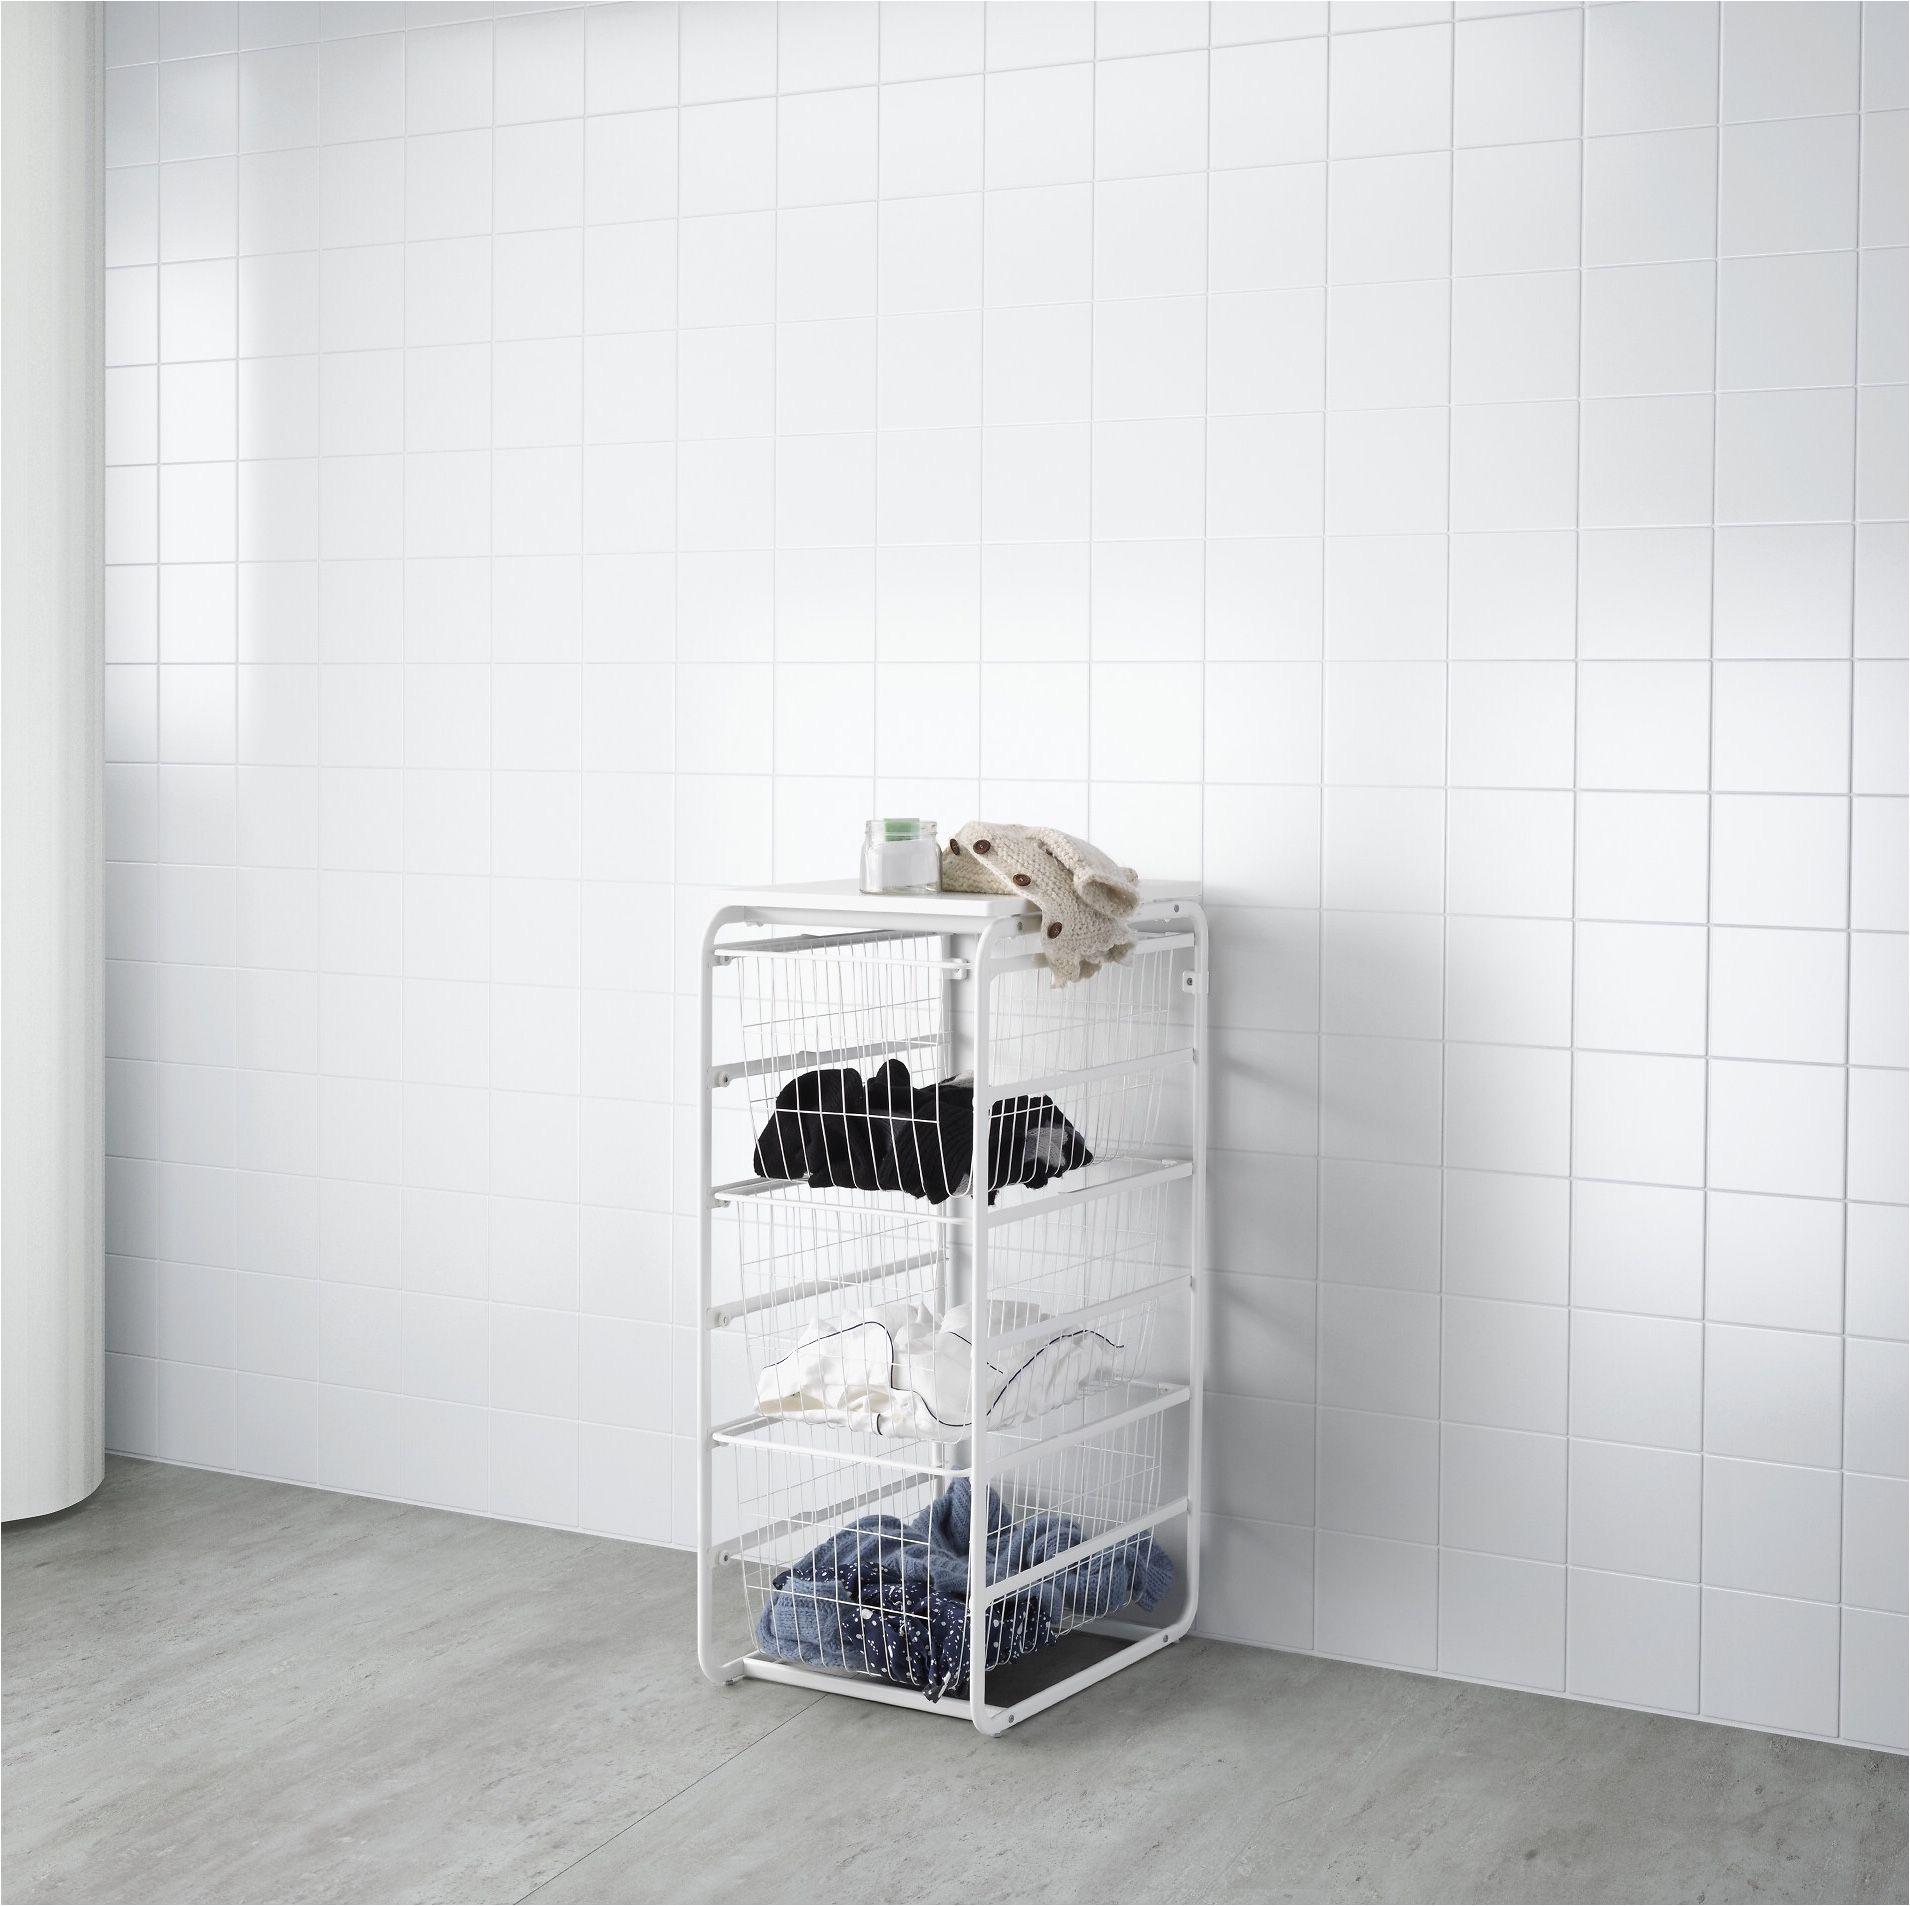 smart storage ikea algot laundry baskets laundry room wire shelves sofa